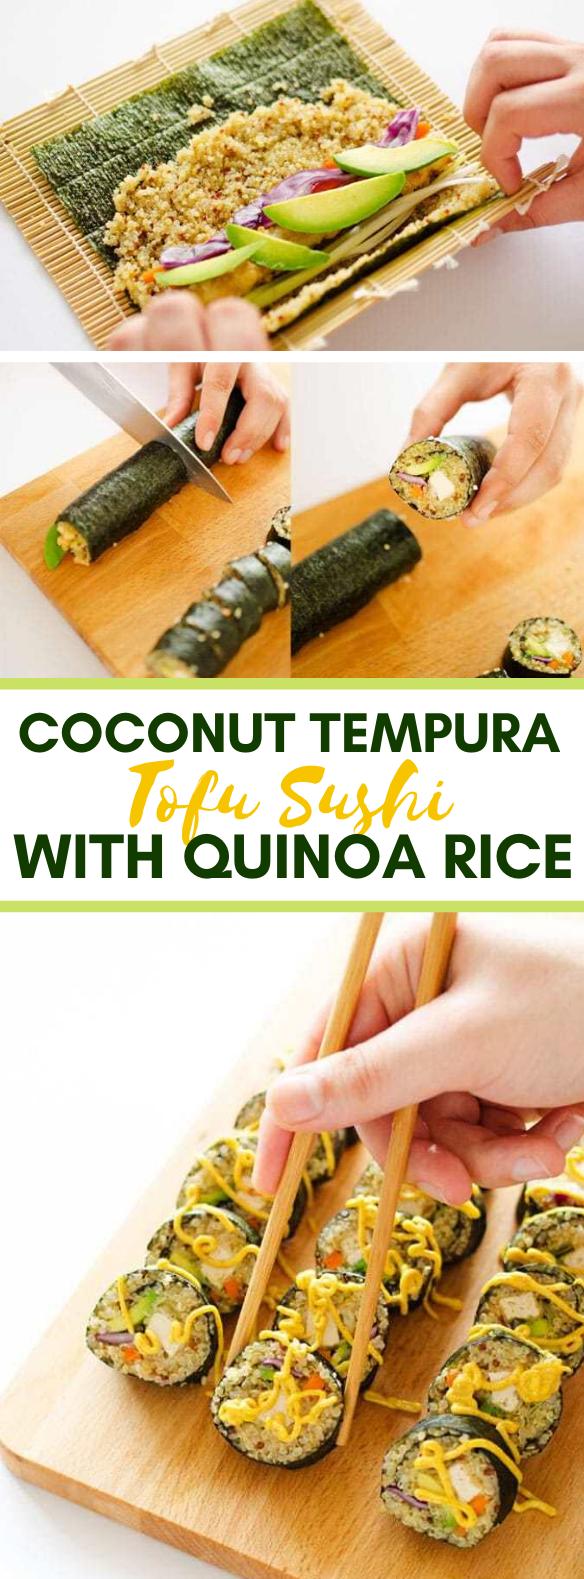 COCONUT TEMPURA TOFU SUSHI WITH QUINOA RICE #vegetarian #healthydinner